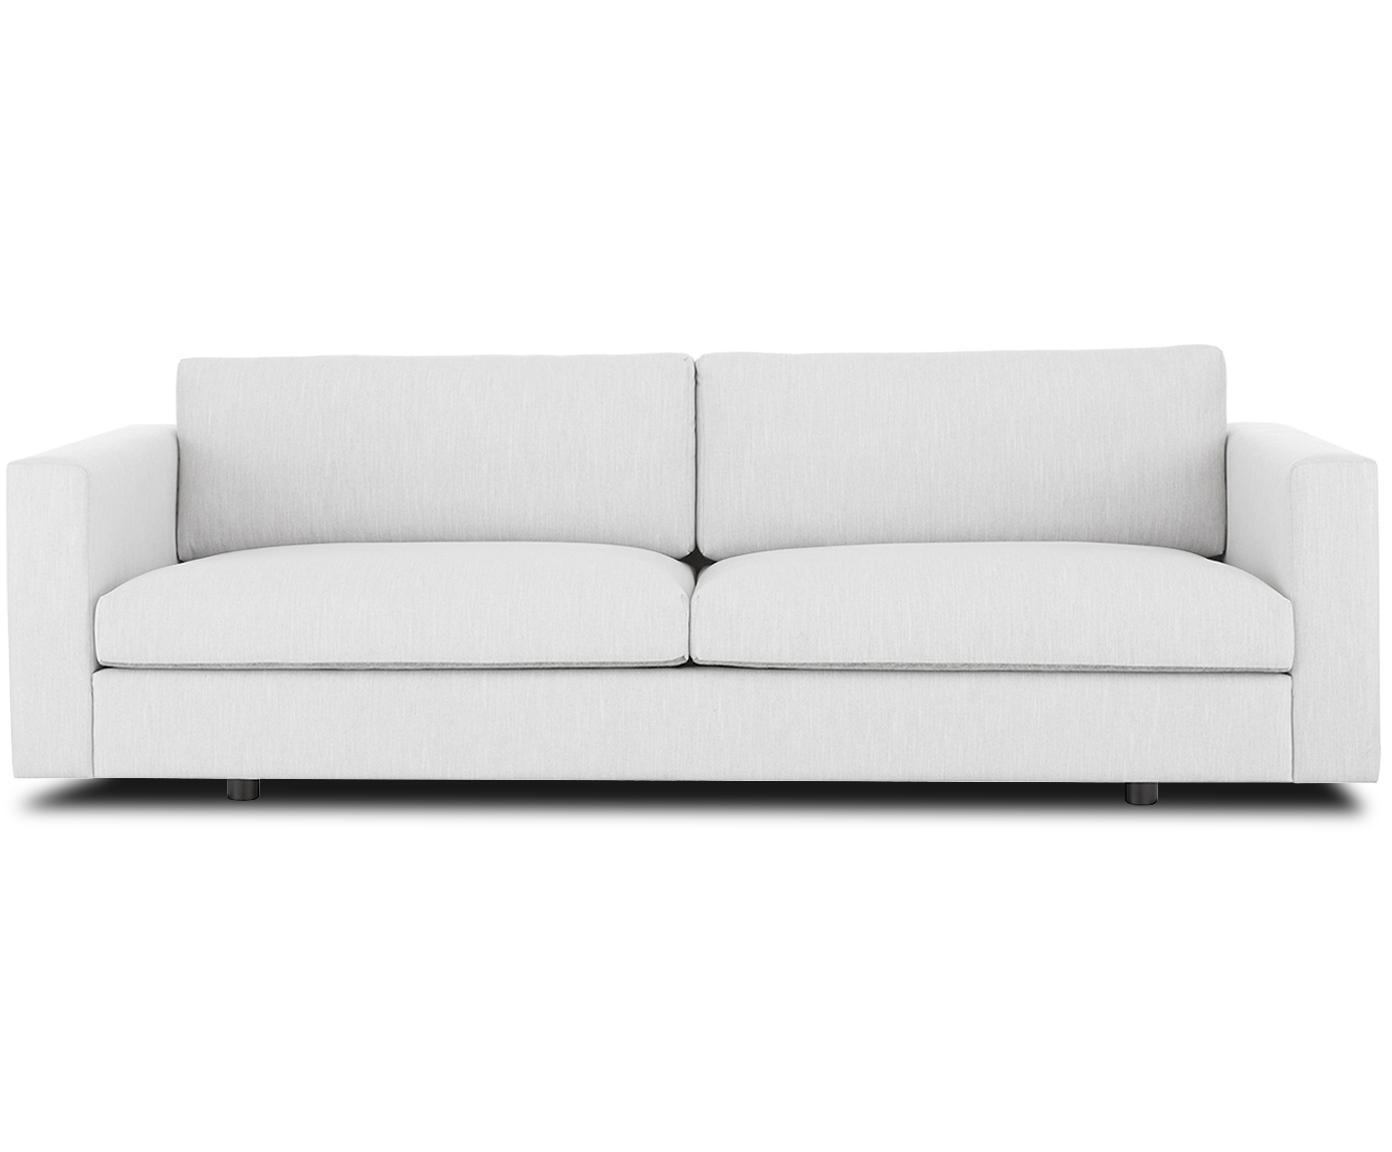 Sofa Balmira (3-Sitzer), Bezug: Polyester 35.000 Scheuert, Gestell: Massives Kiefernholz, Füße: Massives Birkenholz, lack, Webstoff Hellgrau, B 240 x T 96 cm